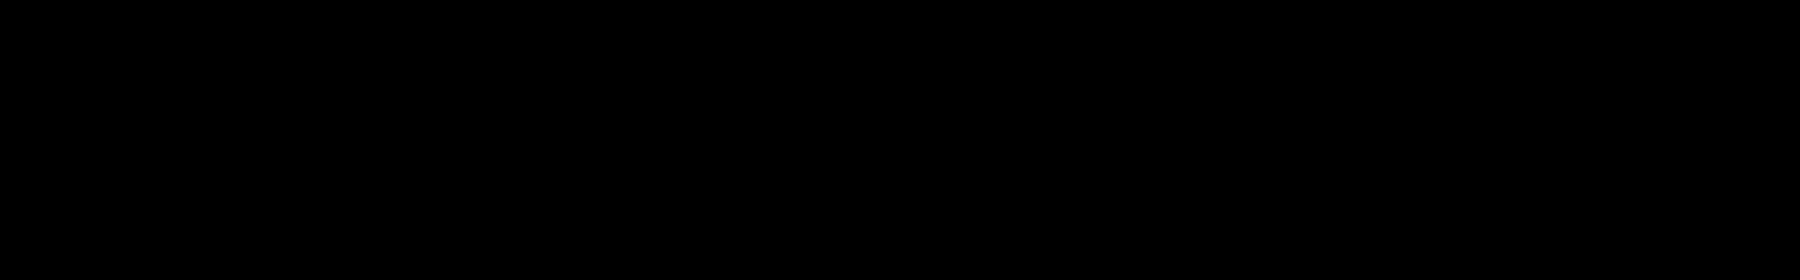 808 One-Shots audio waveform